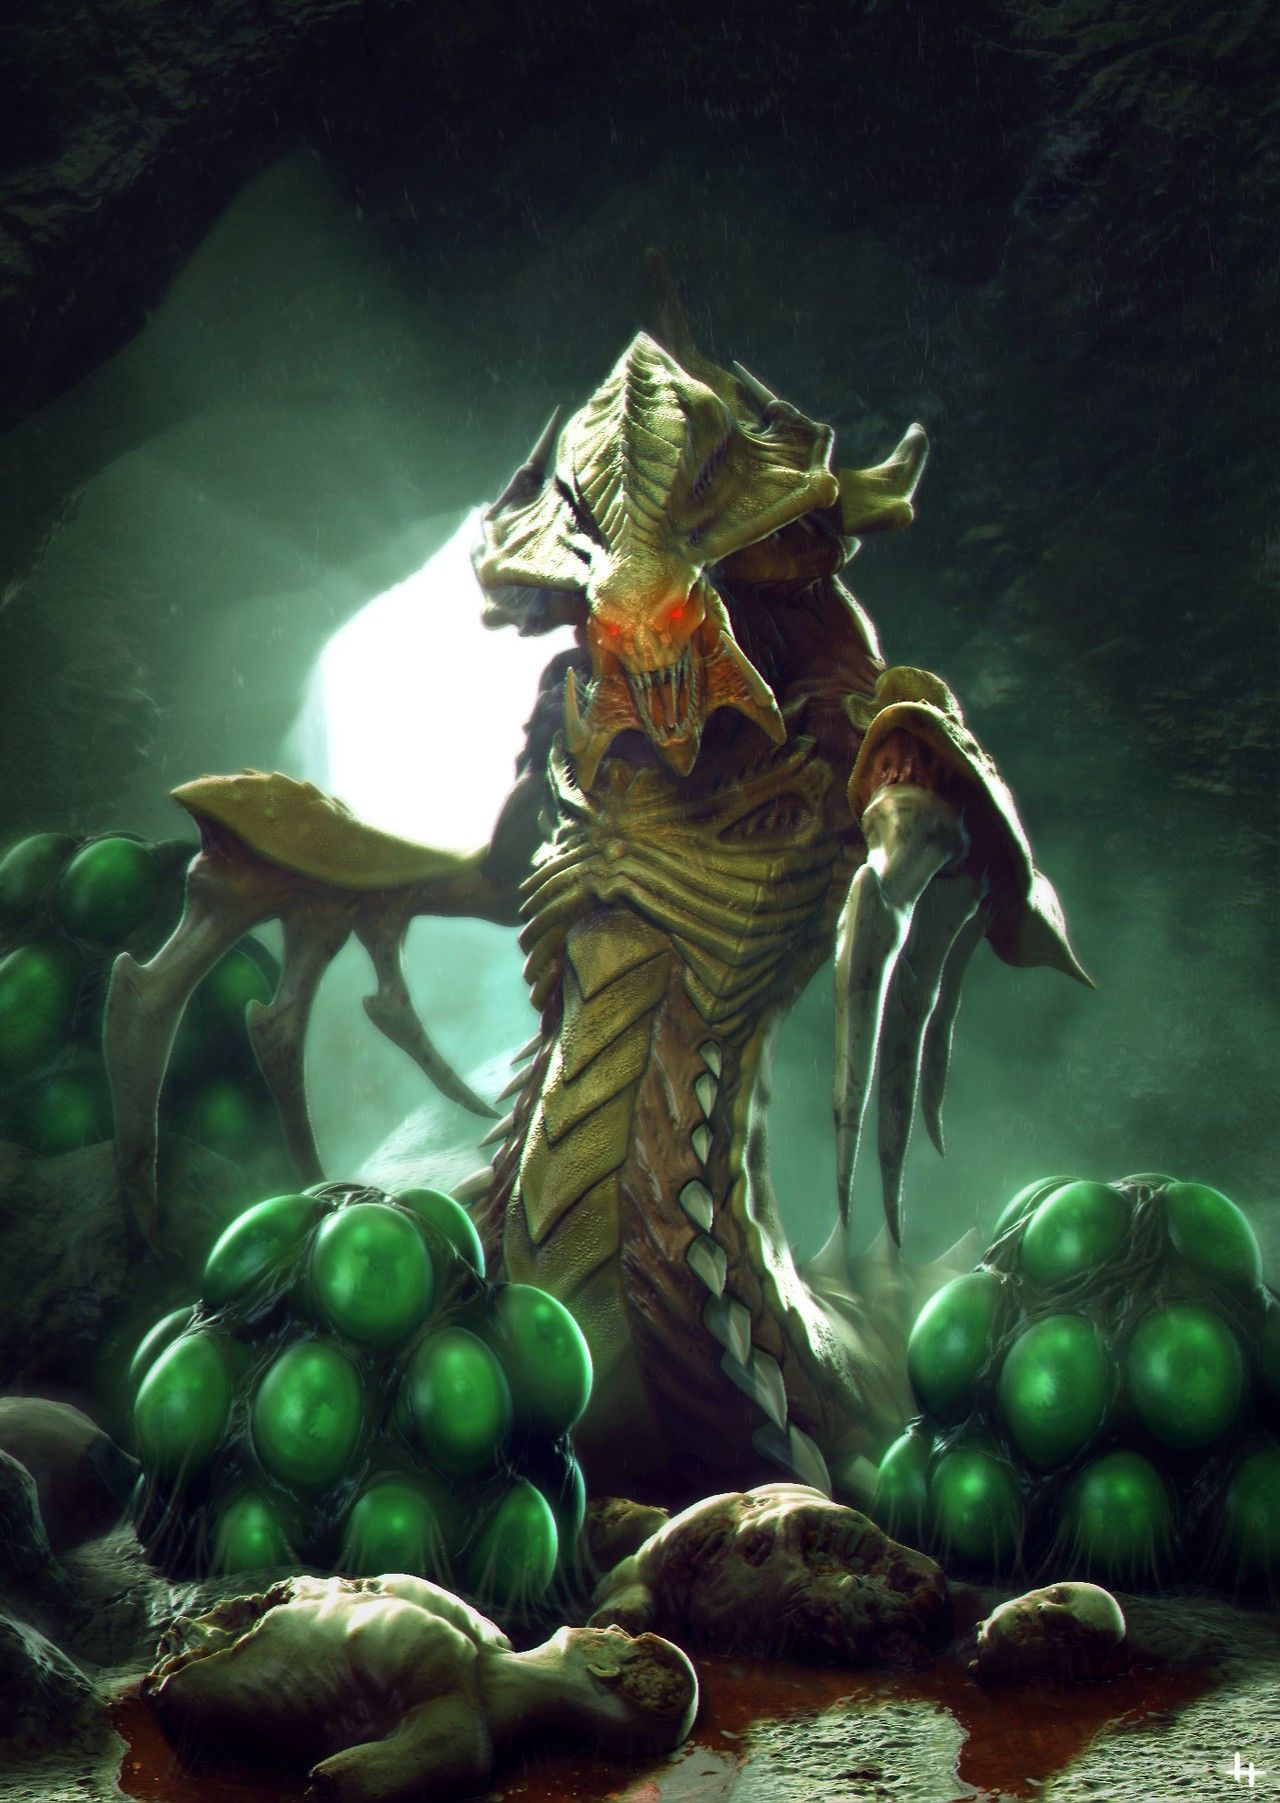 Pin By Michael Neff On Xeno Anthropology Starcraft Starcraft 2 Fantasy Dragon